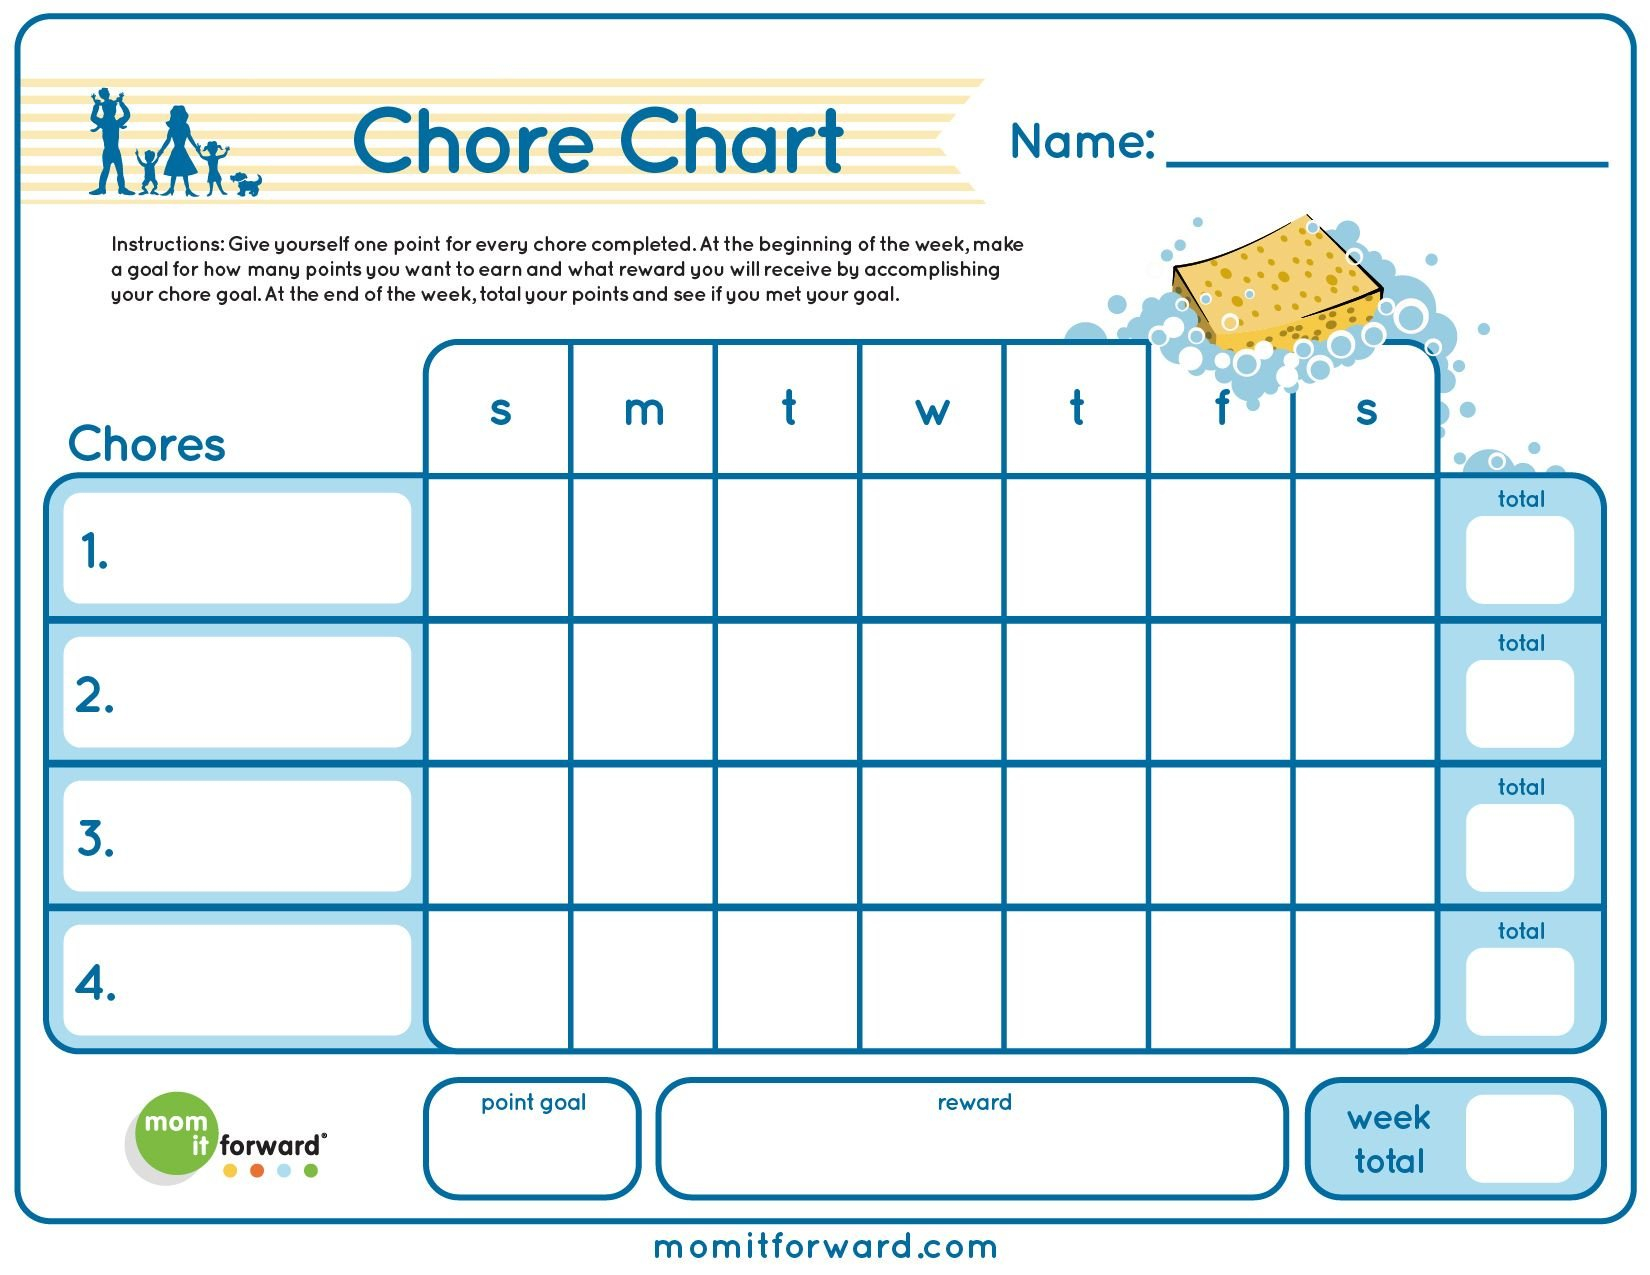 Chore Chart Printable | Chore Chart, Printable Chore Chart Printable Two Week Chart